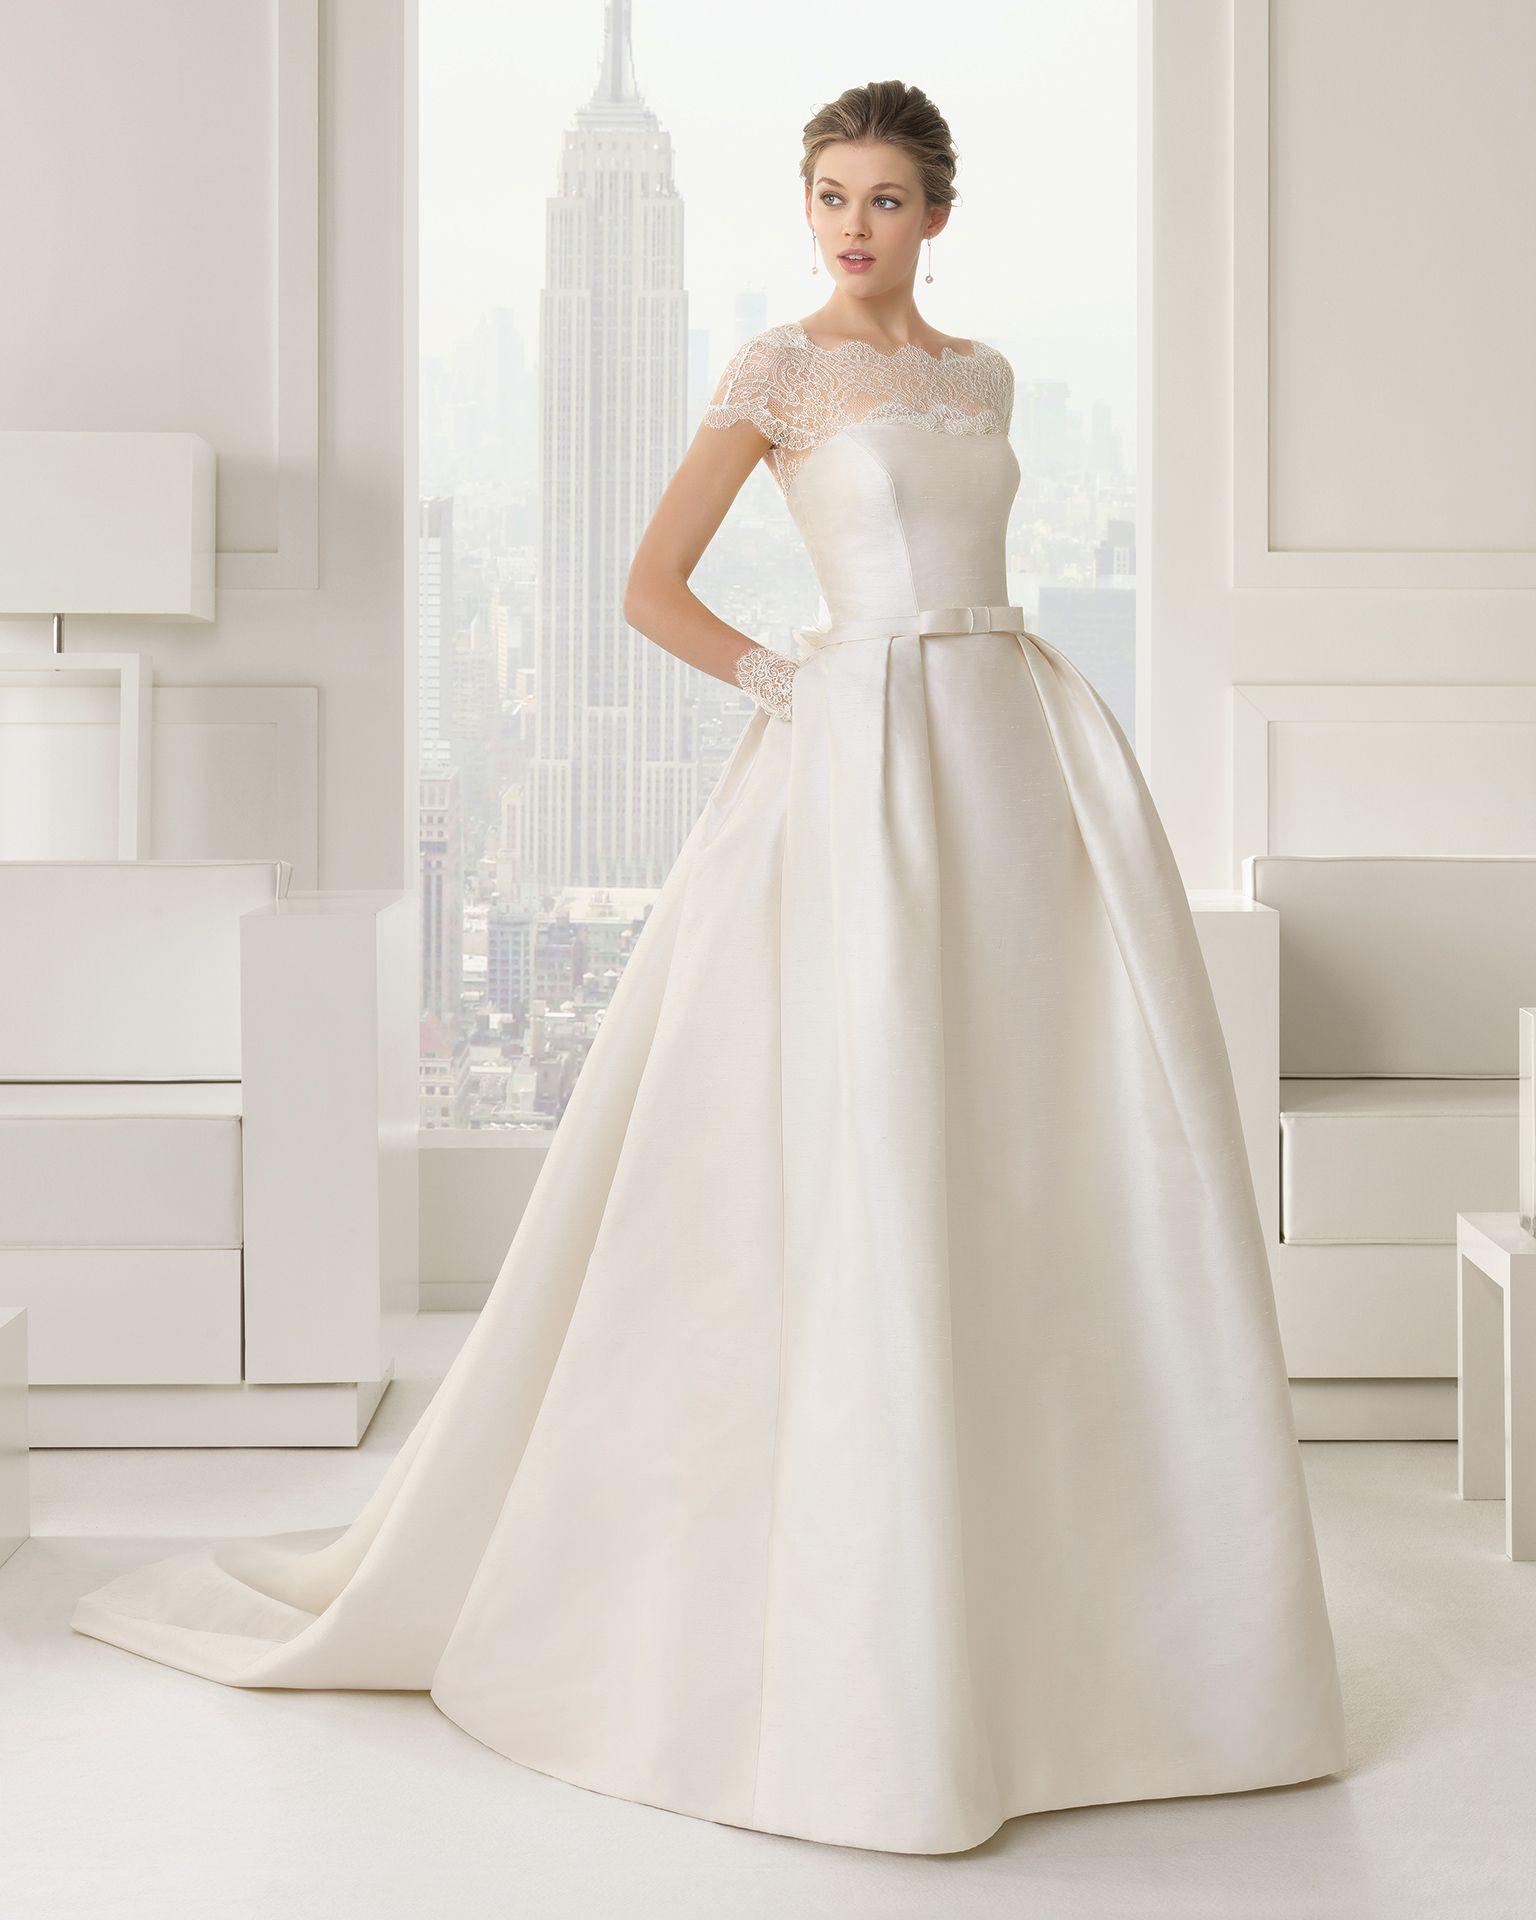 Wedding Dress // CHANDRA - Brautkleid aus Mikado-Seide in A-Linie ...